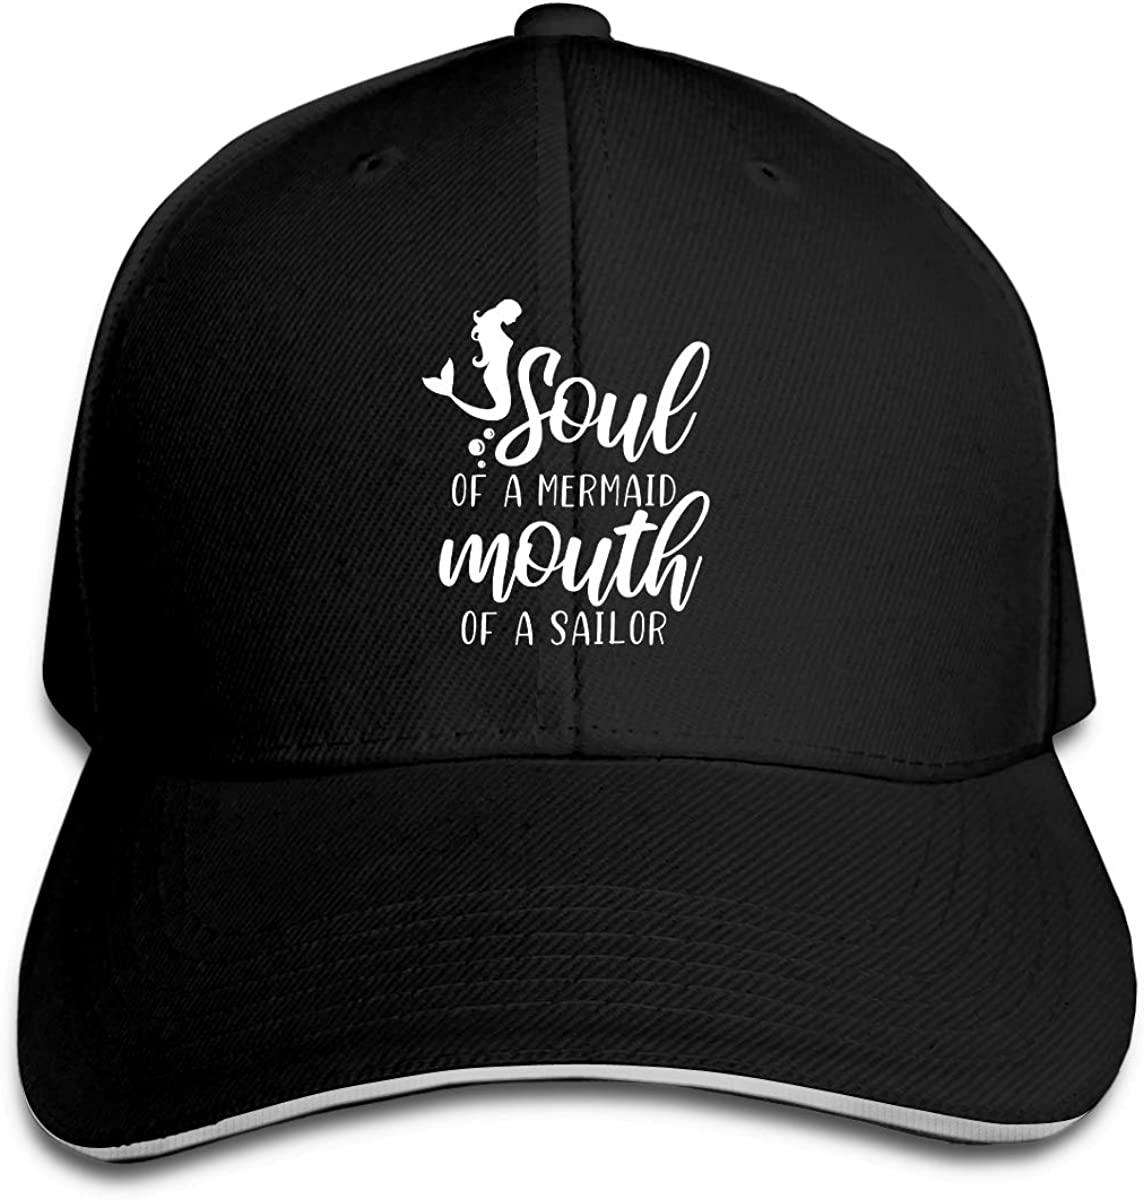 Soul of Mermaid Mouth of Sailor Logo Classic Adjustable Cotton Baseball Caps Trucker Driver Hat Outdoor Cap Black